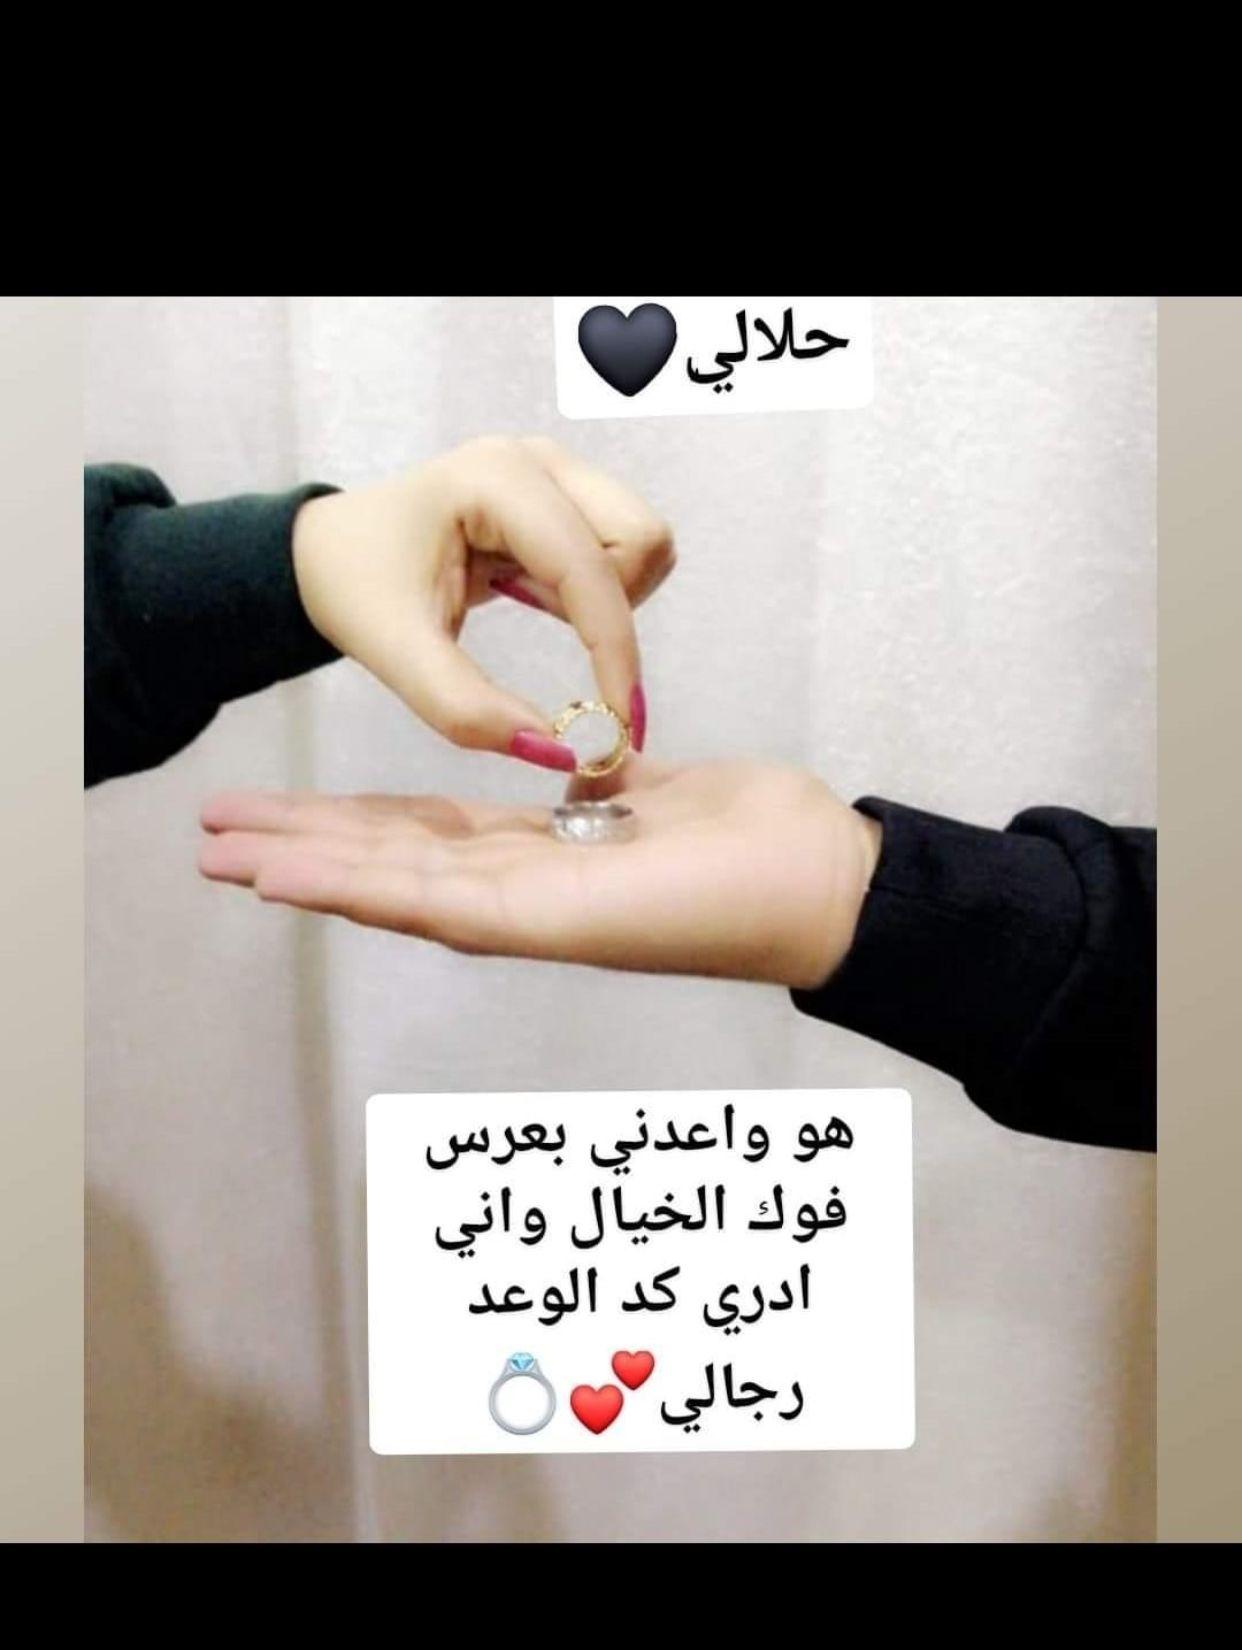 كد الوعد رجالي Arabic Love Quotes Love Quotes Quotes